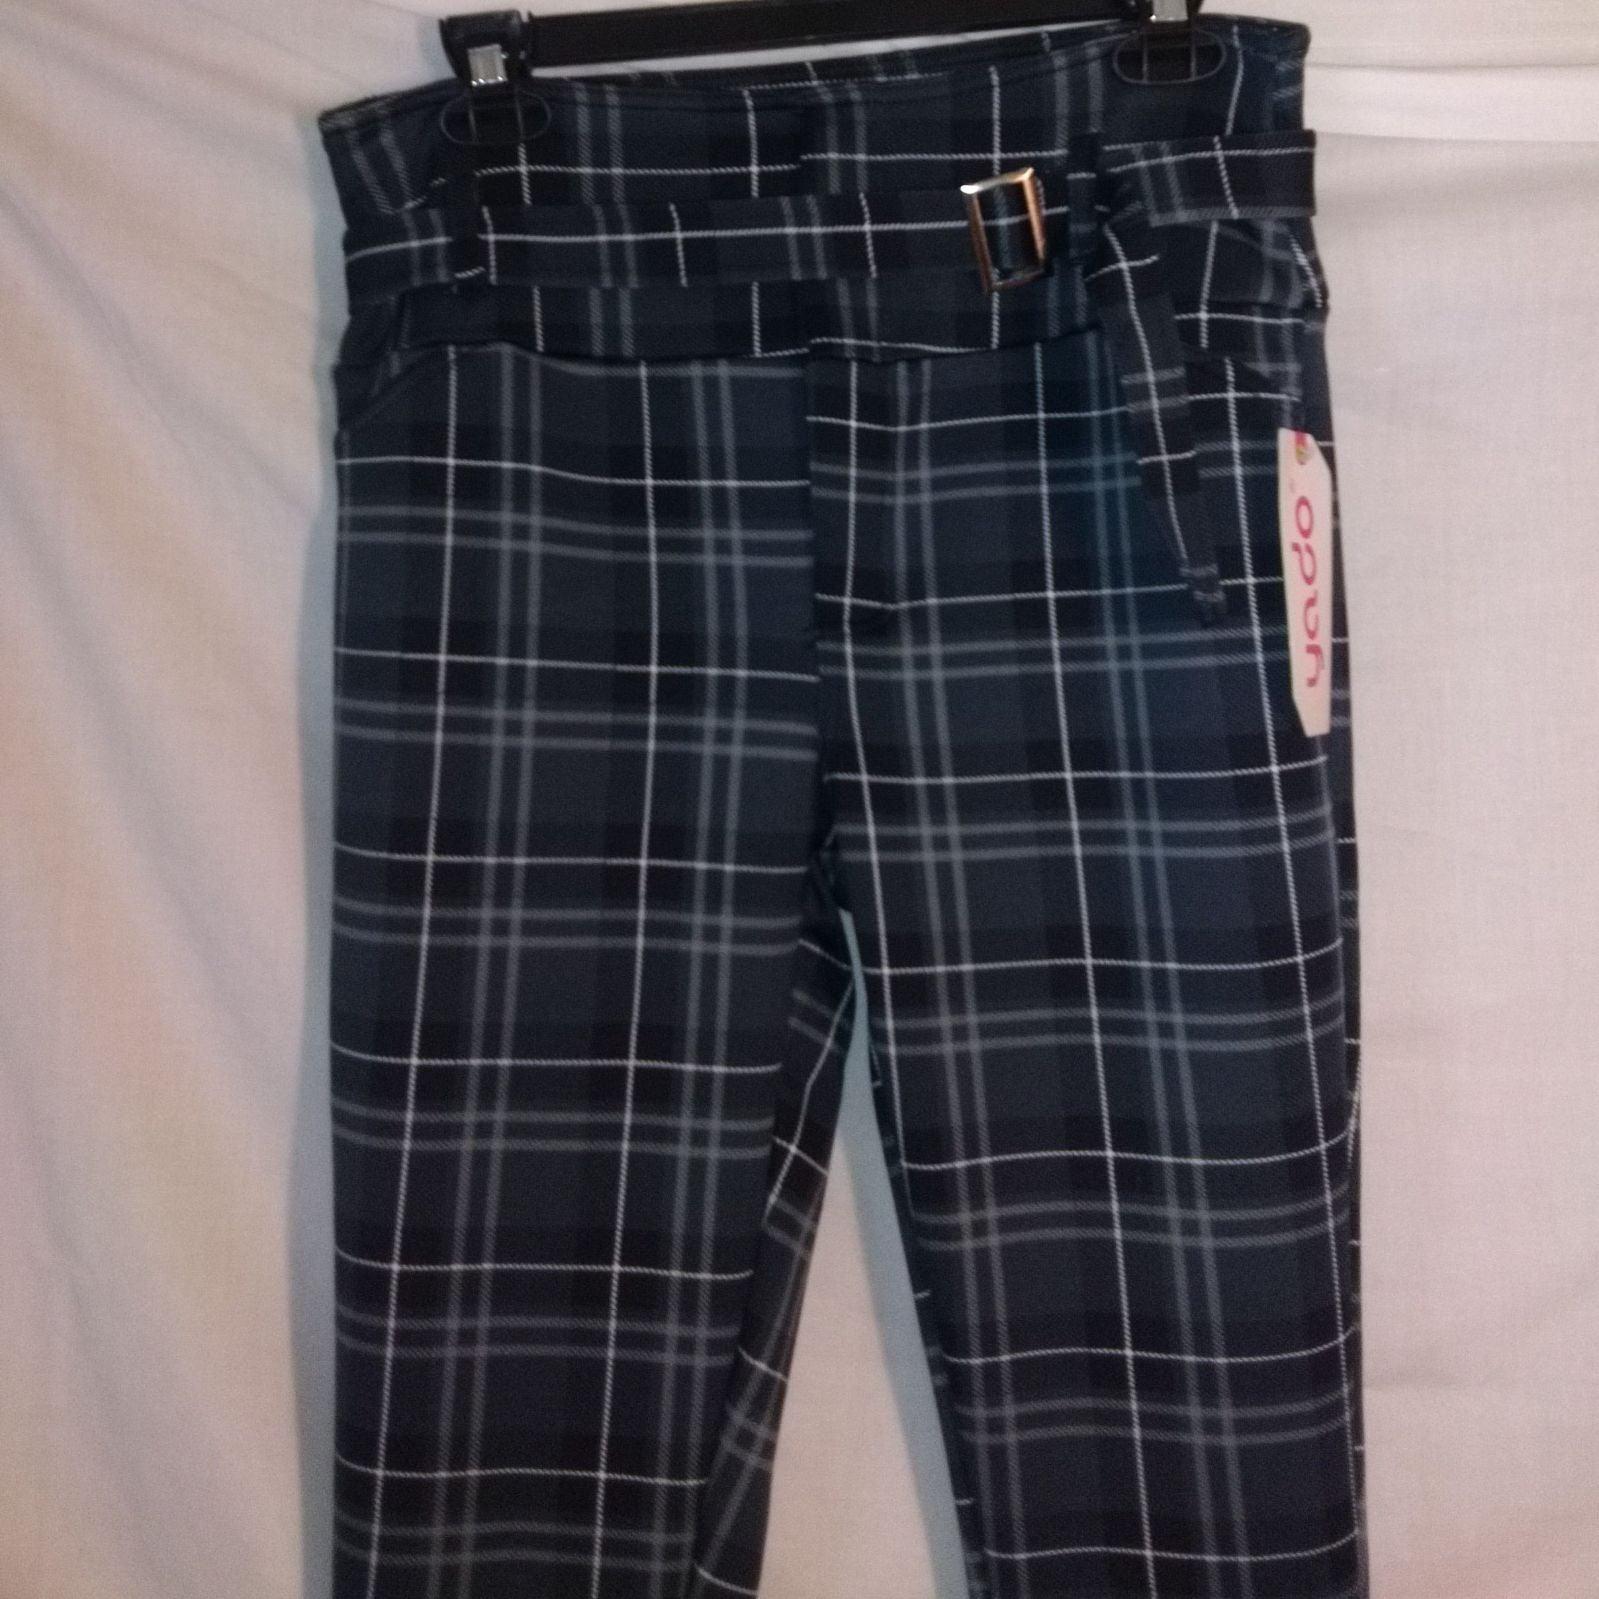 Black and grey/white plaid pants punk go